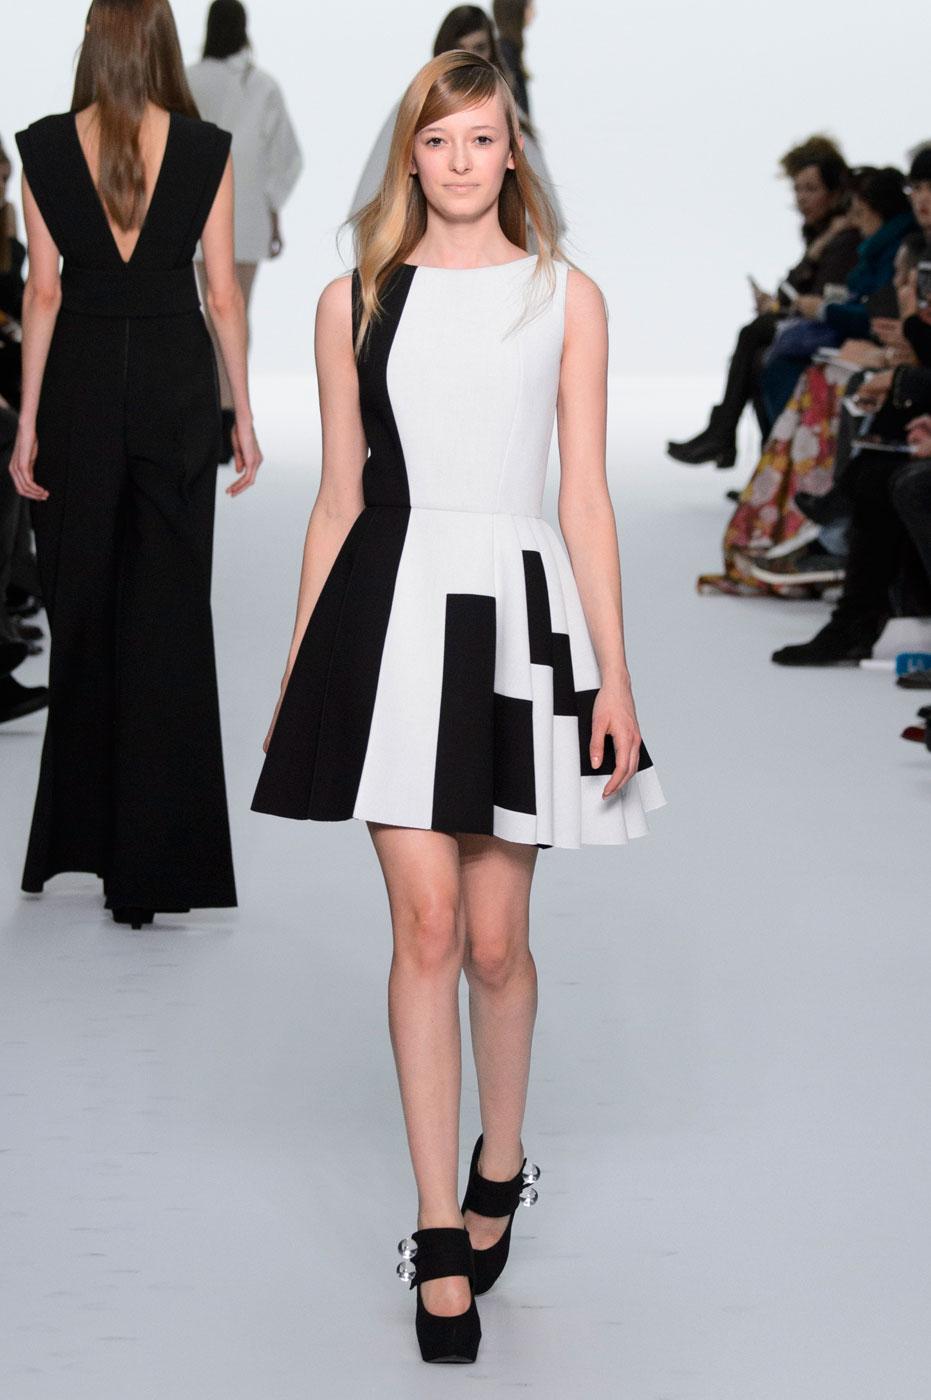 Kayek-fashion-runway-show-haute-couture-paris-spring-summer-2015-the-impression-15